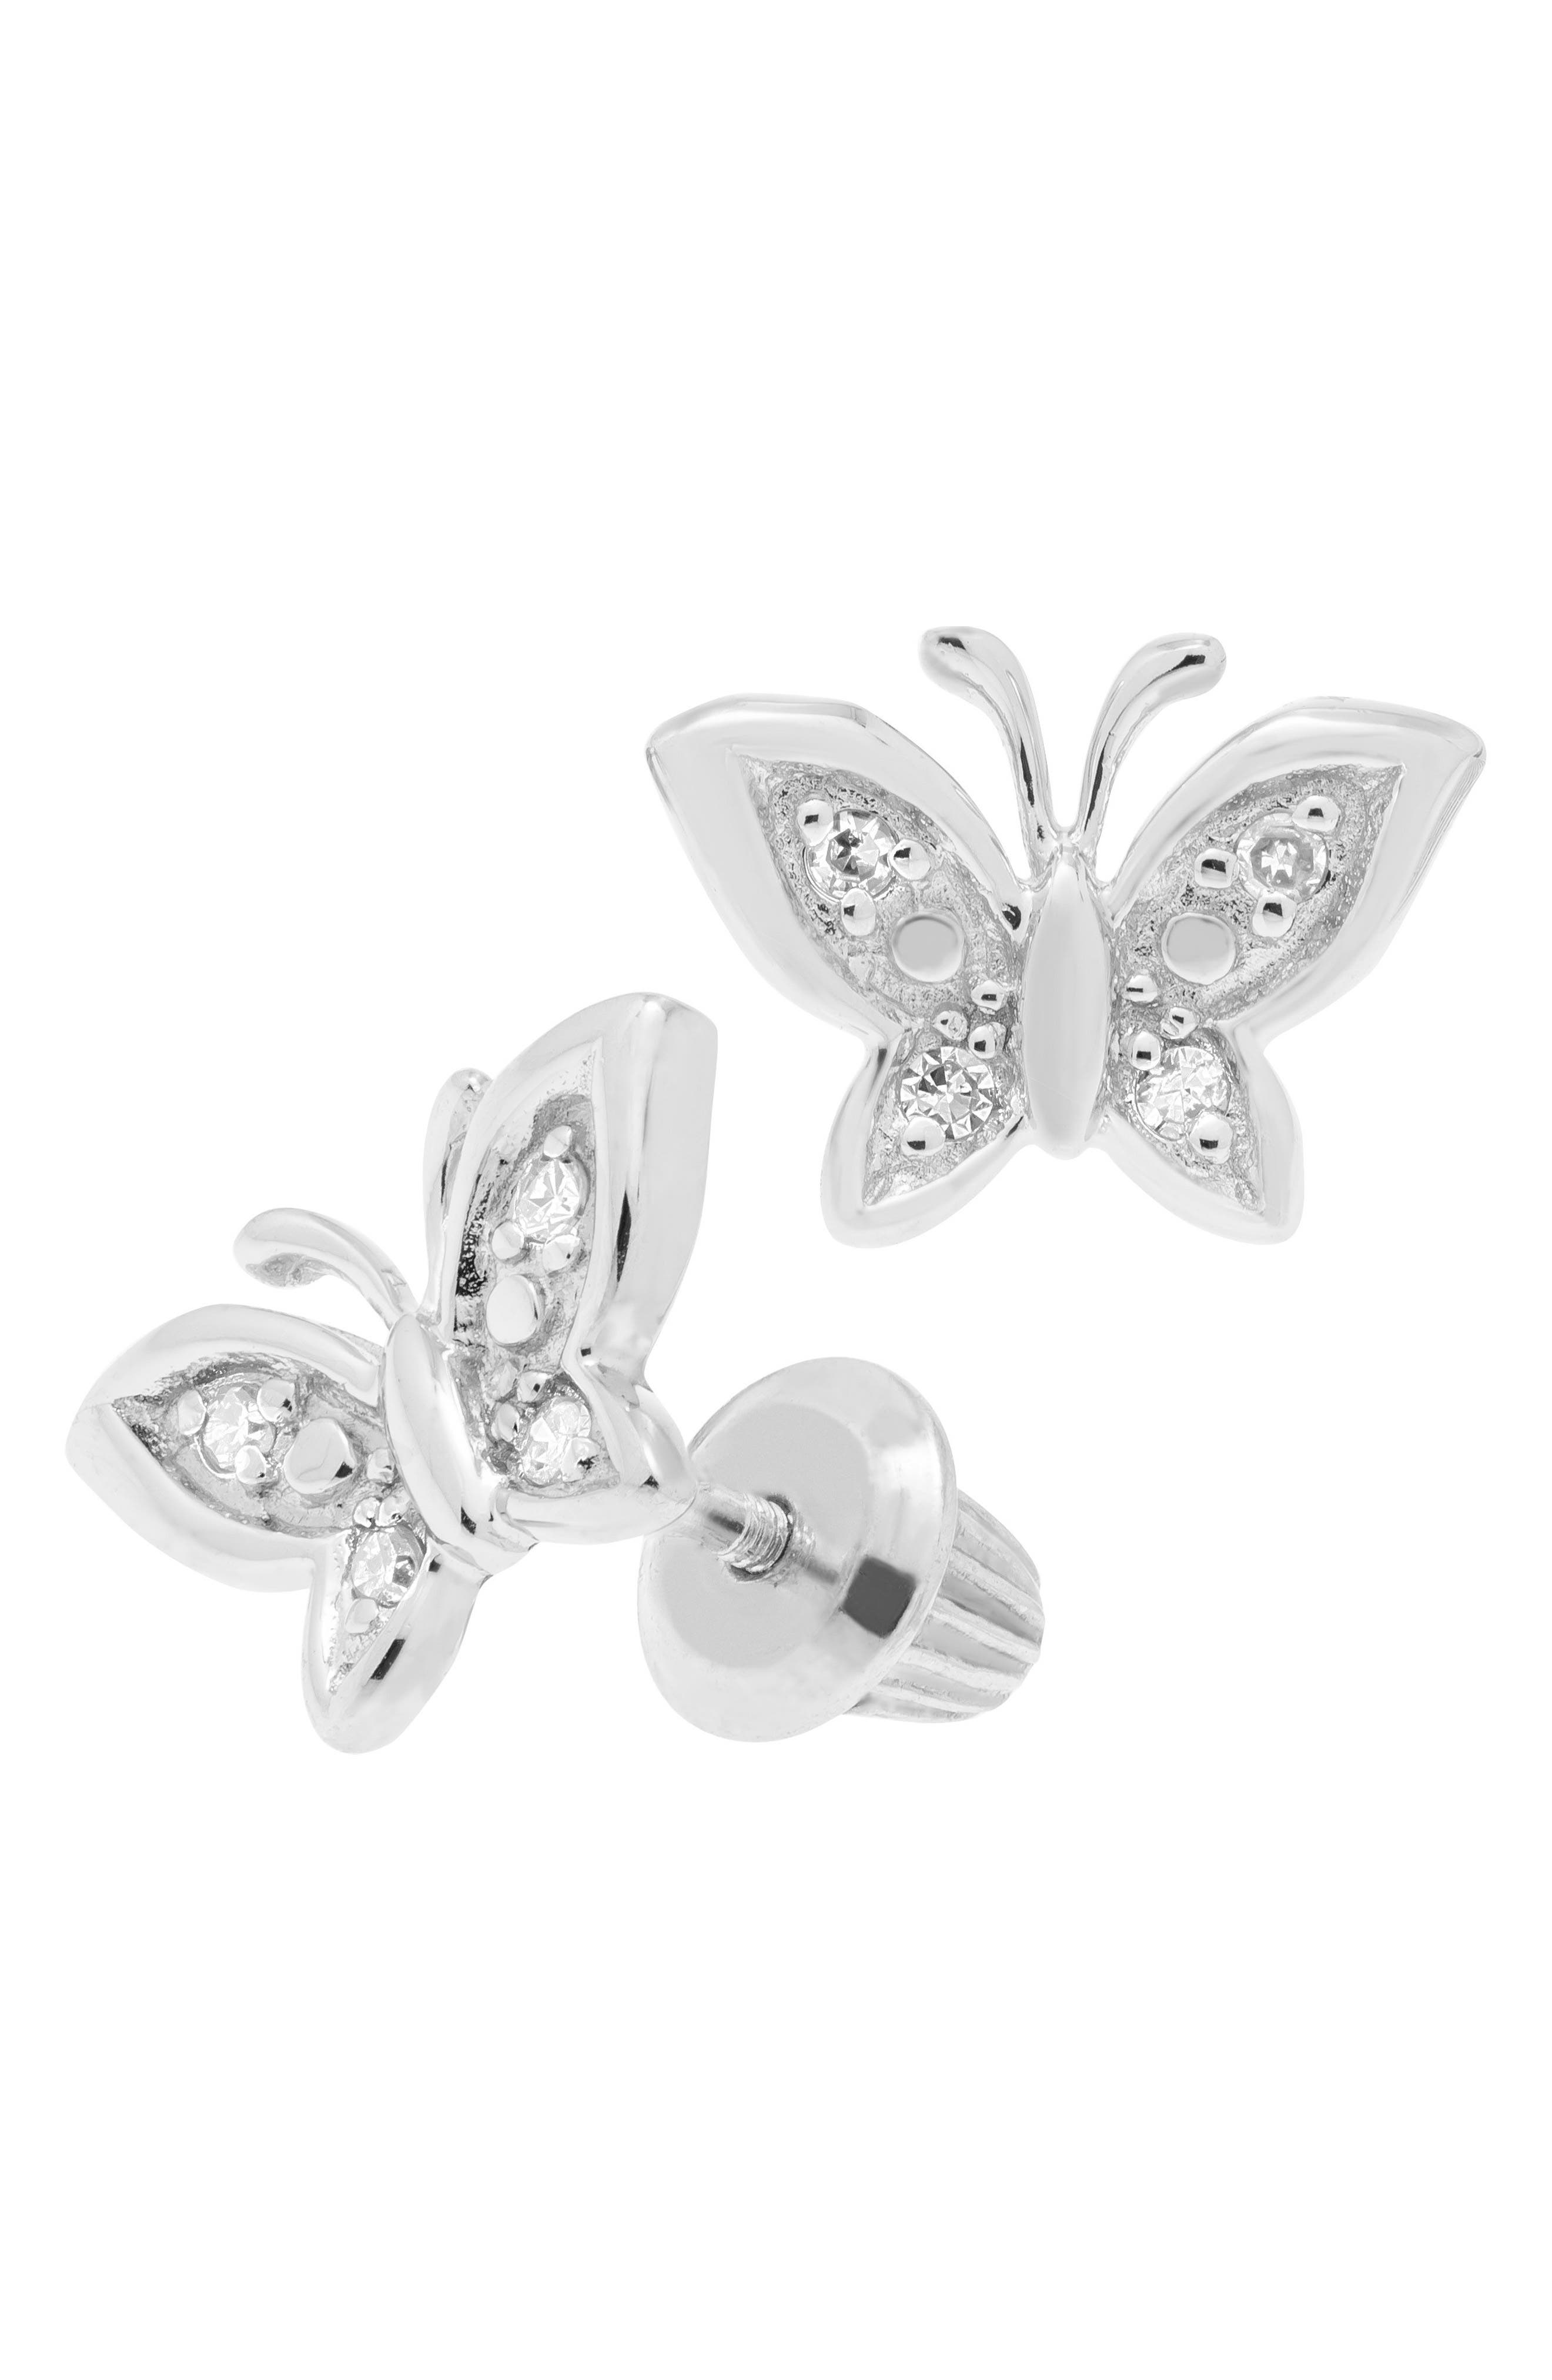 Sterling Silver & Diamond Butterfly Stud Earrings,                         Main,                         color, SILVER